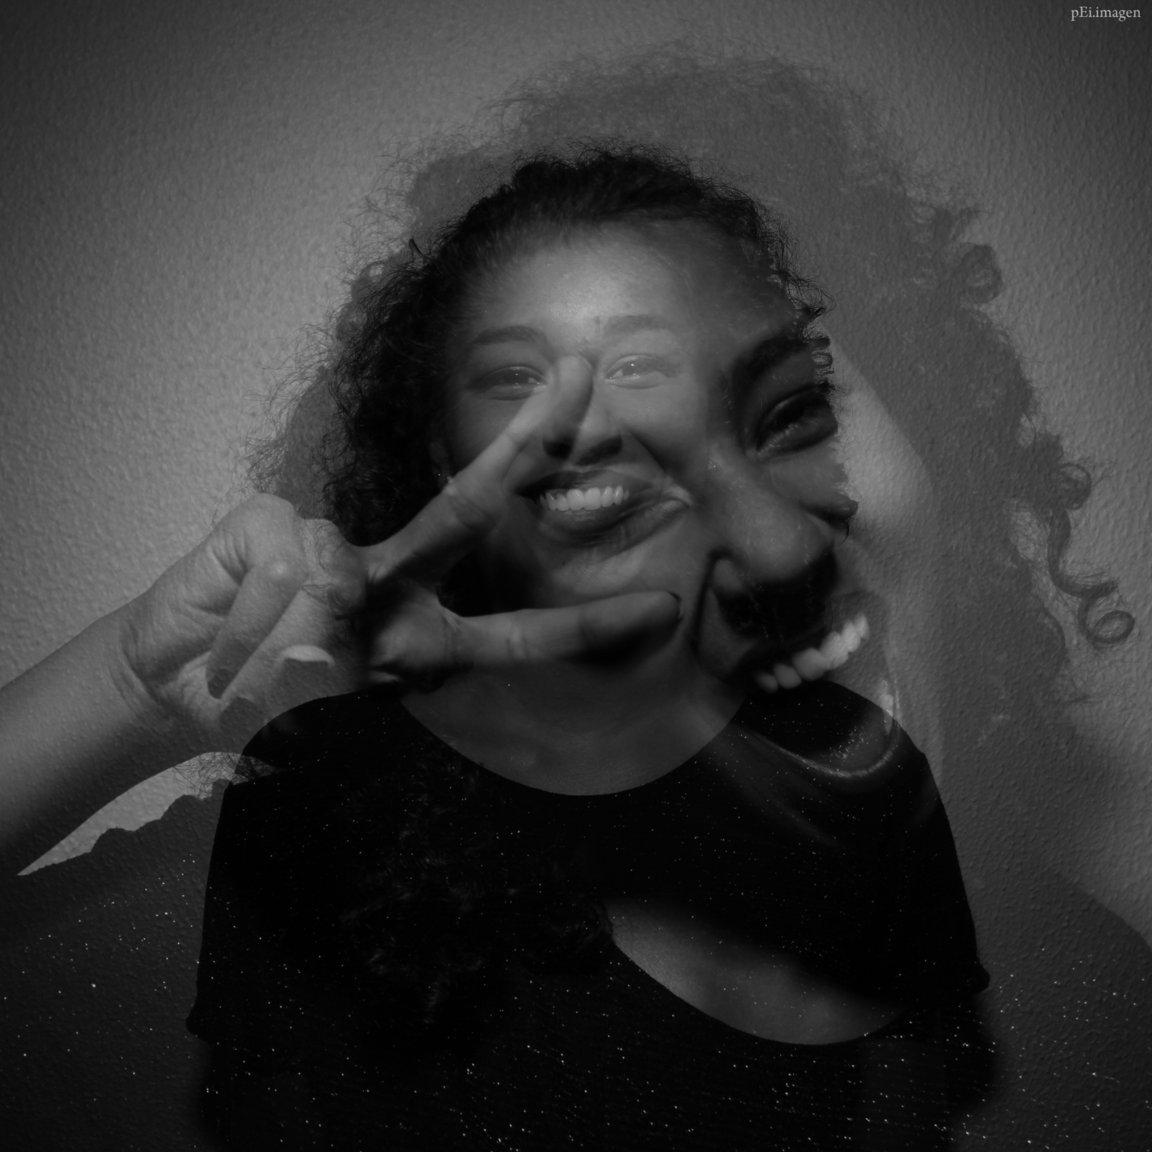 peipegata me myself I proyectos fotografia peipegatafotografia # 115 Sara Yasmine Ahamed